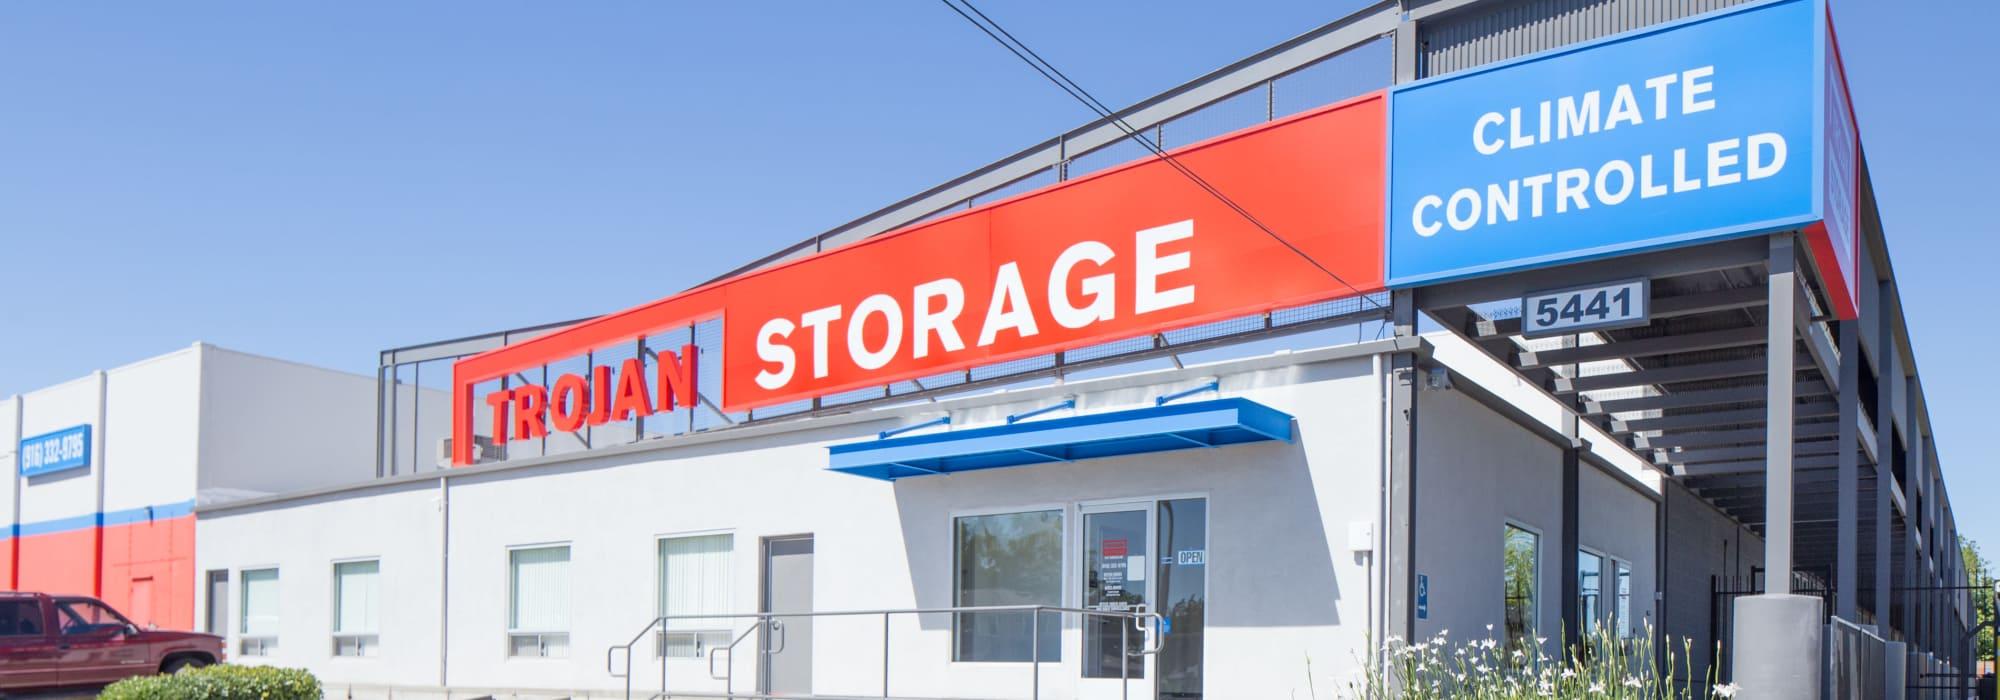 Self storage at Trojan Storage in Sacramento California